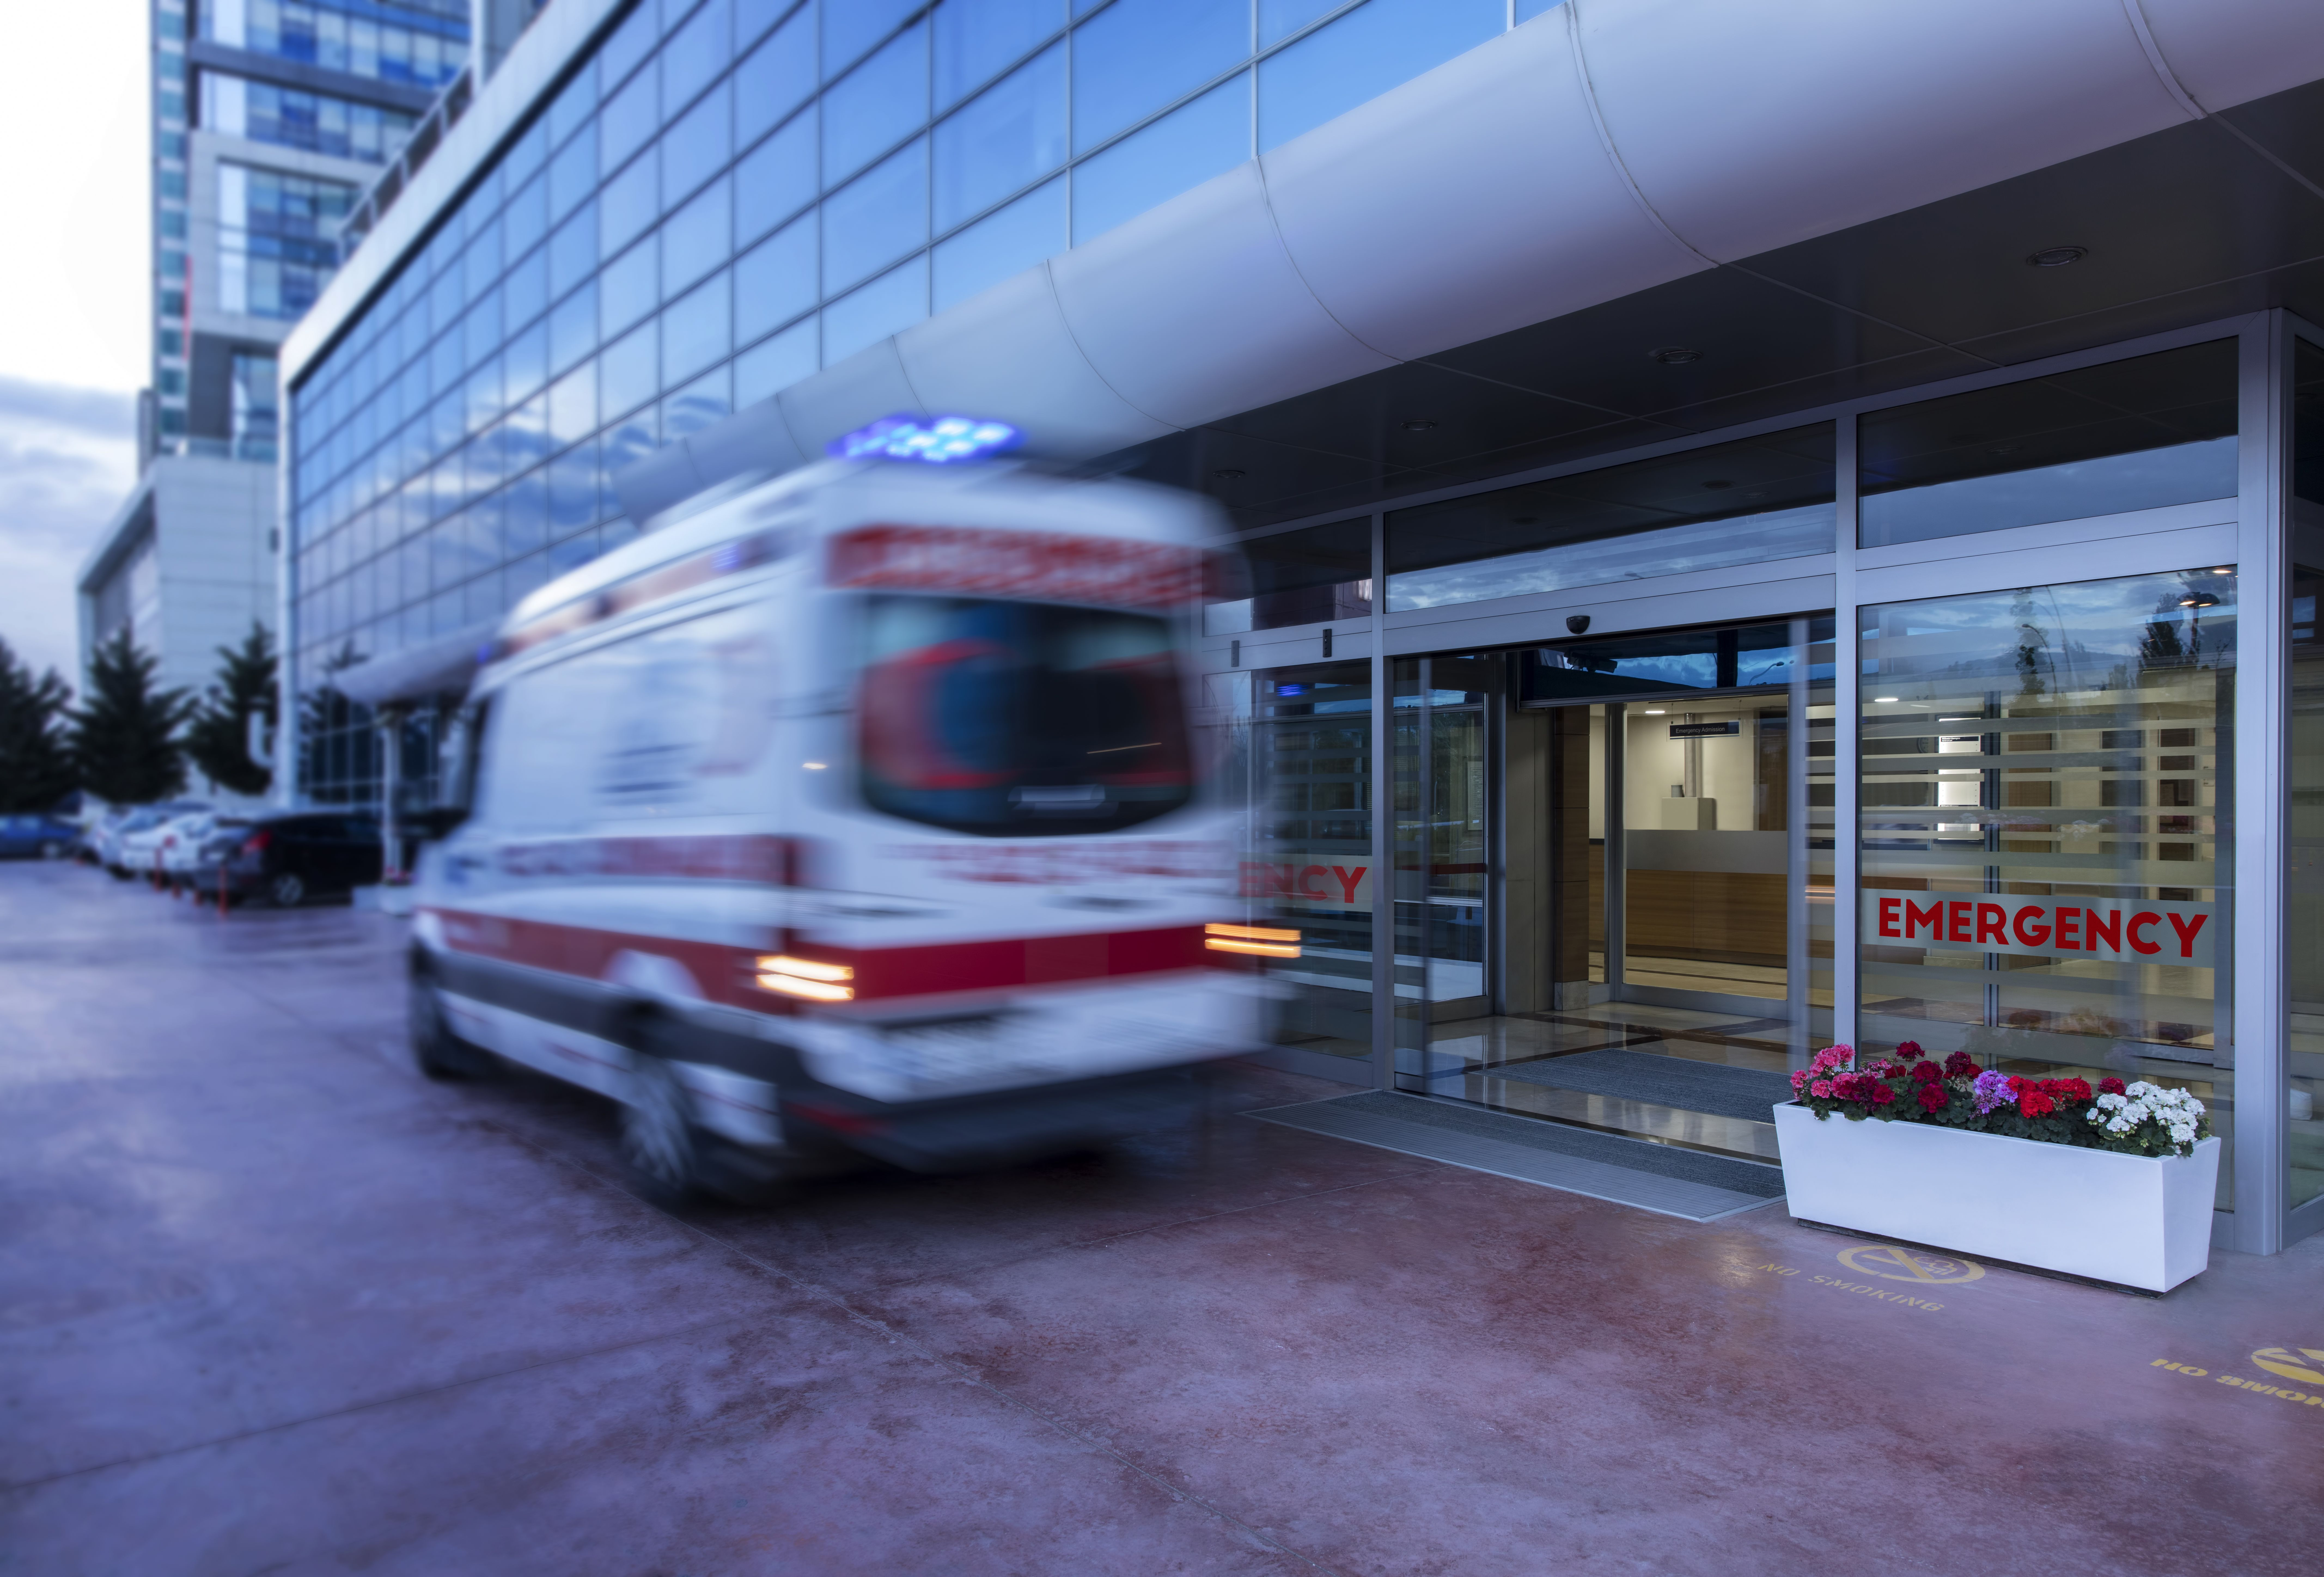 Servicio de emergencias para todo tipo de eventos en Murcia